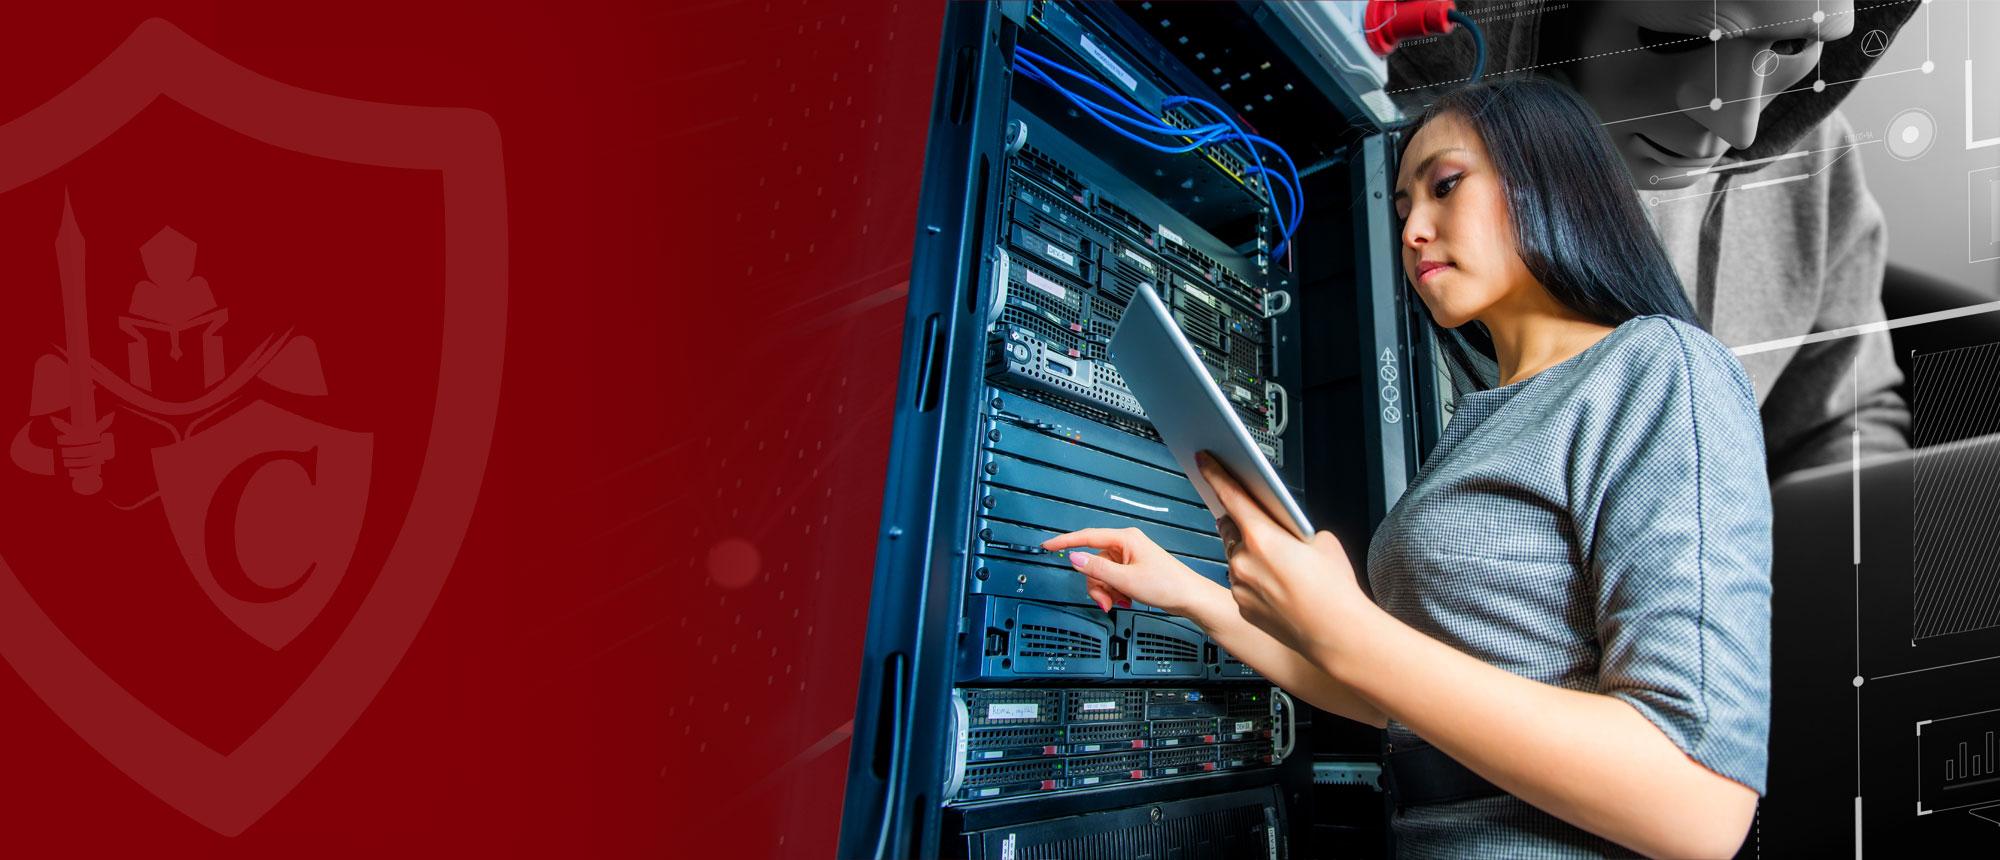 Castellan Information Security Services Inc.